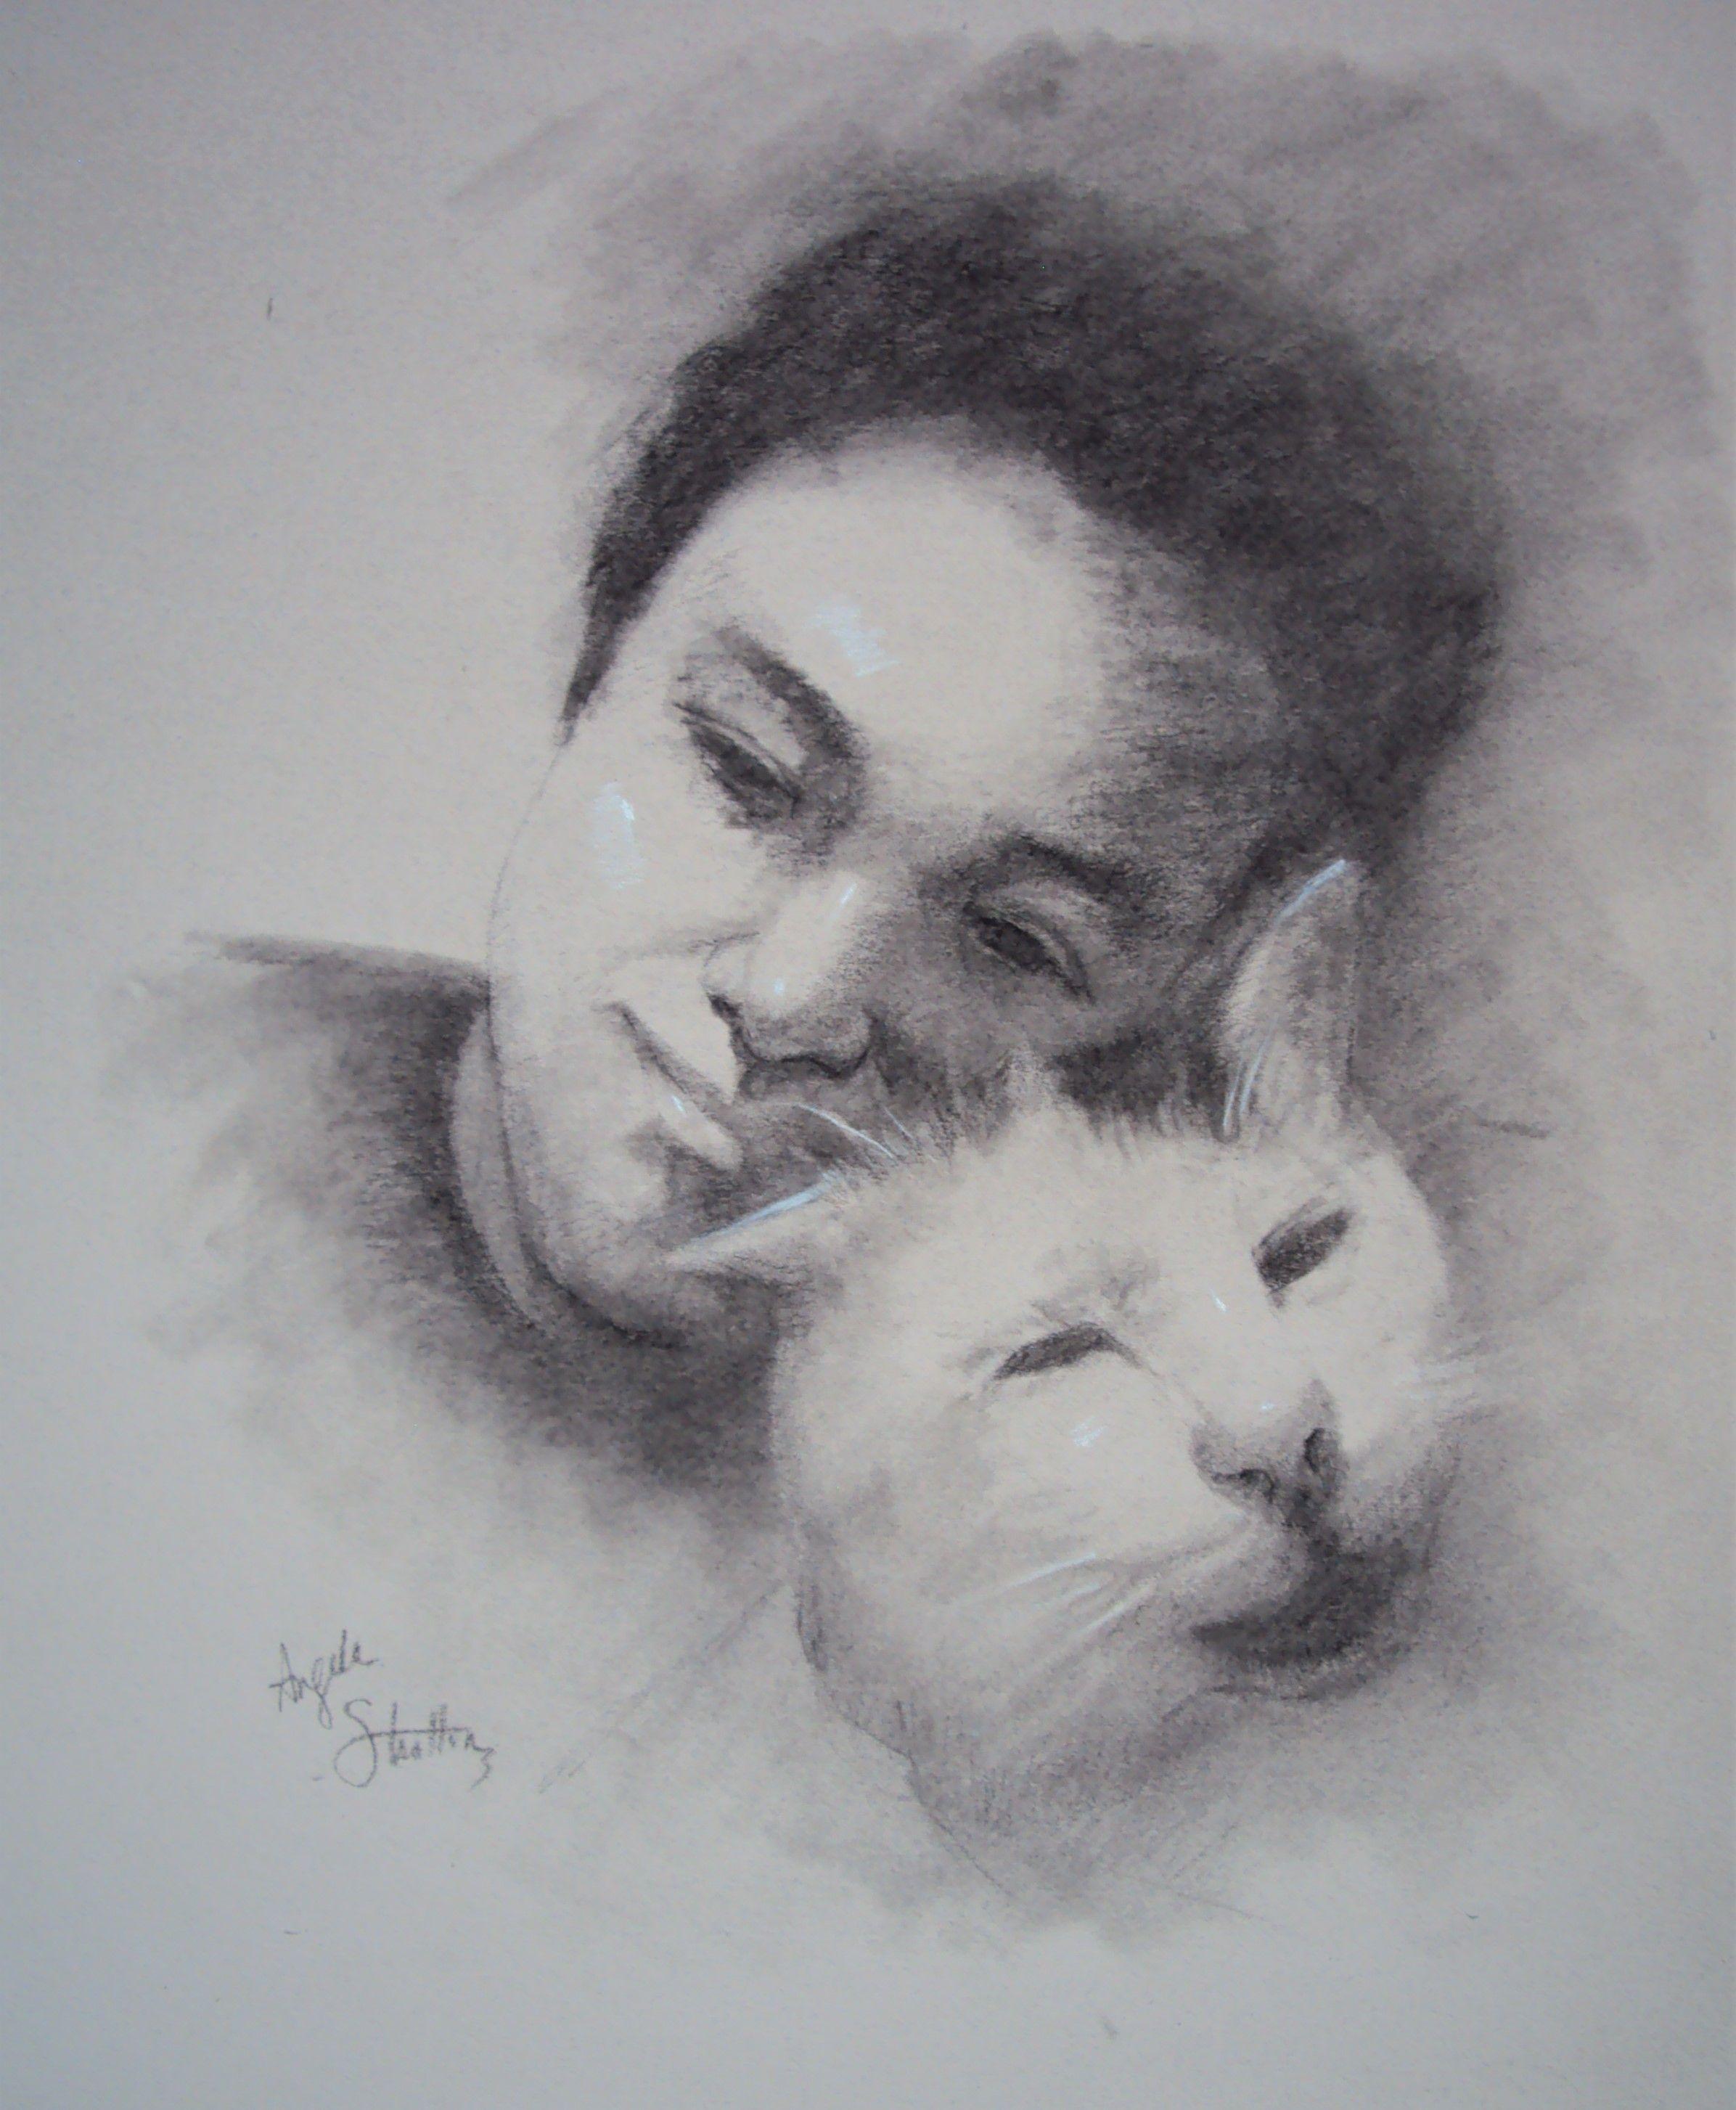 Artist: Angela Stratton, Carbon Pencil